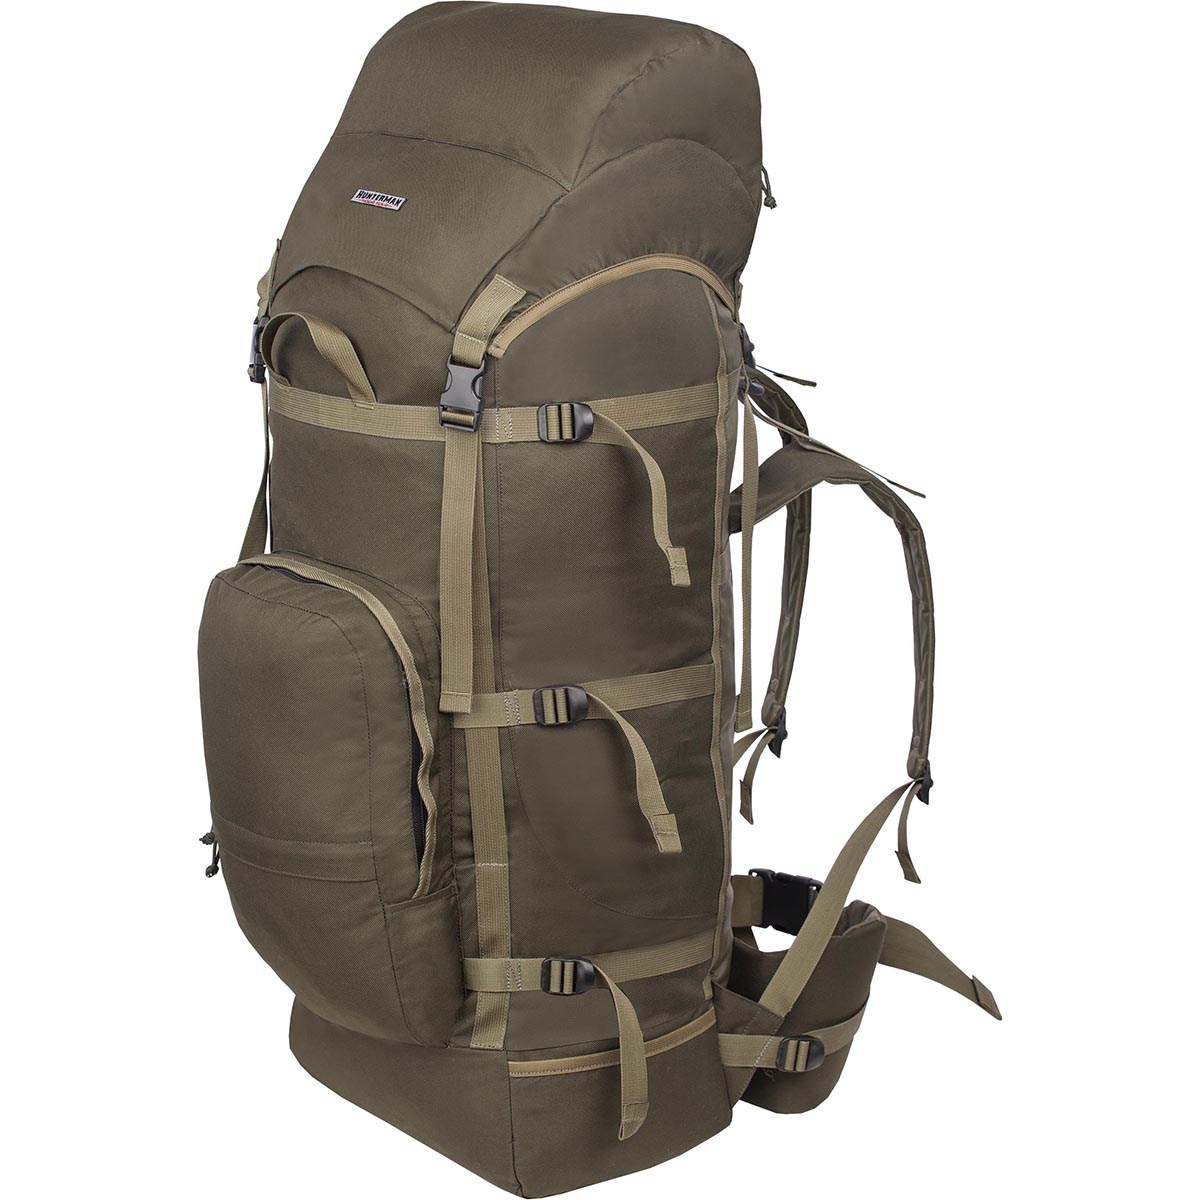 Рюкзак для охоты HunterMan Nova Tour Медведь 100 V3, цвет: зеленый, 100 л